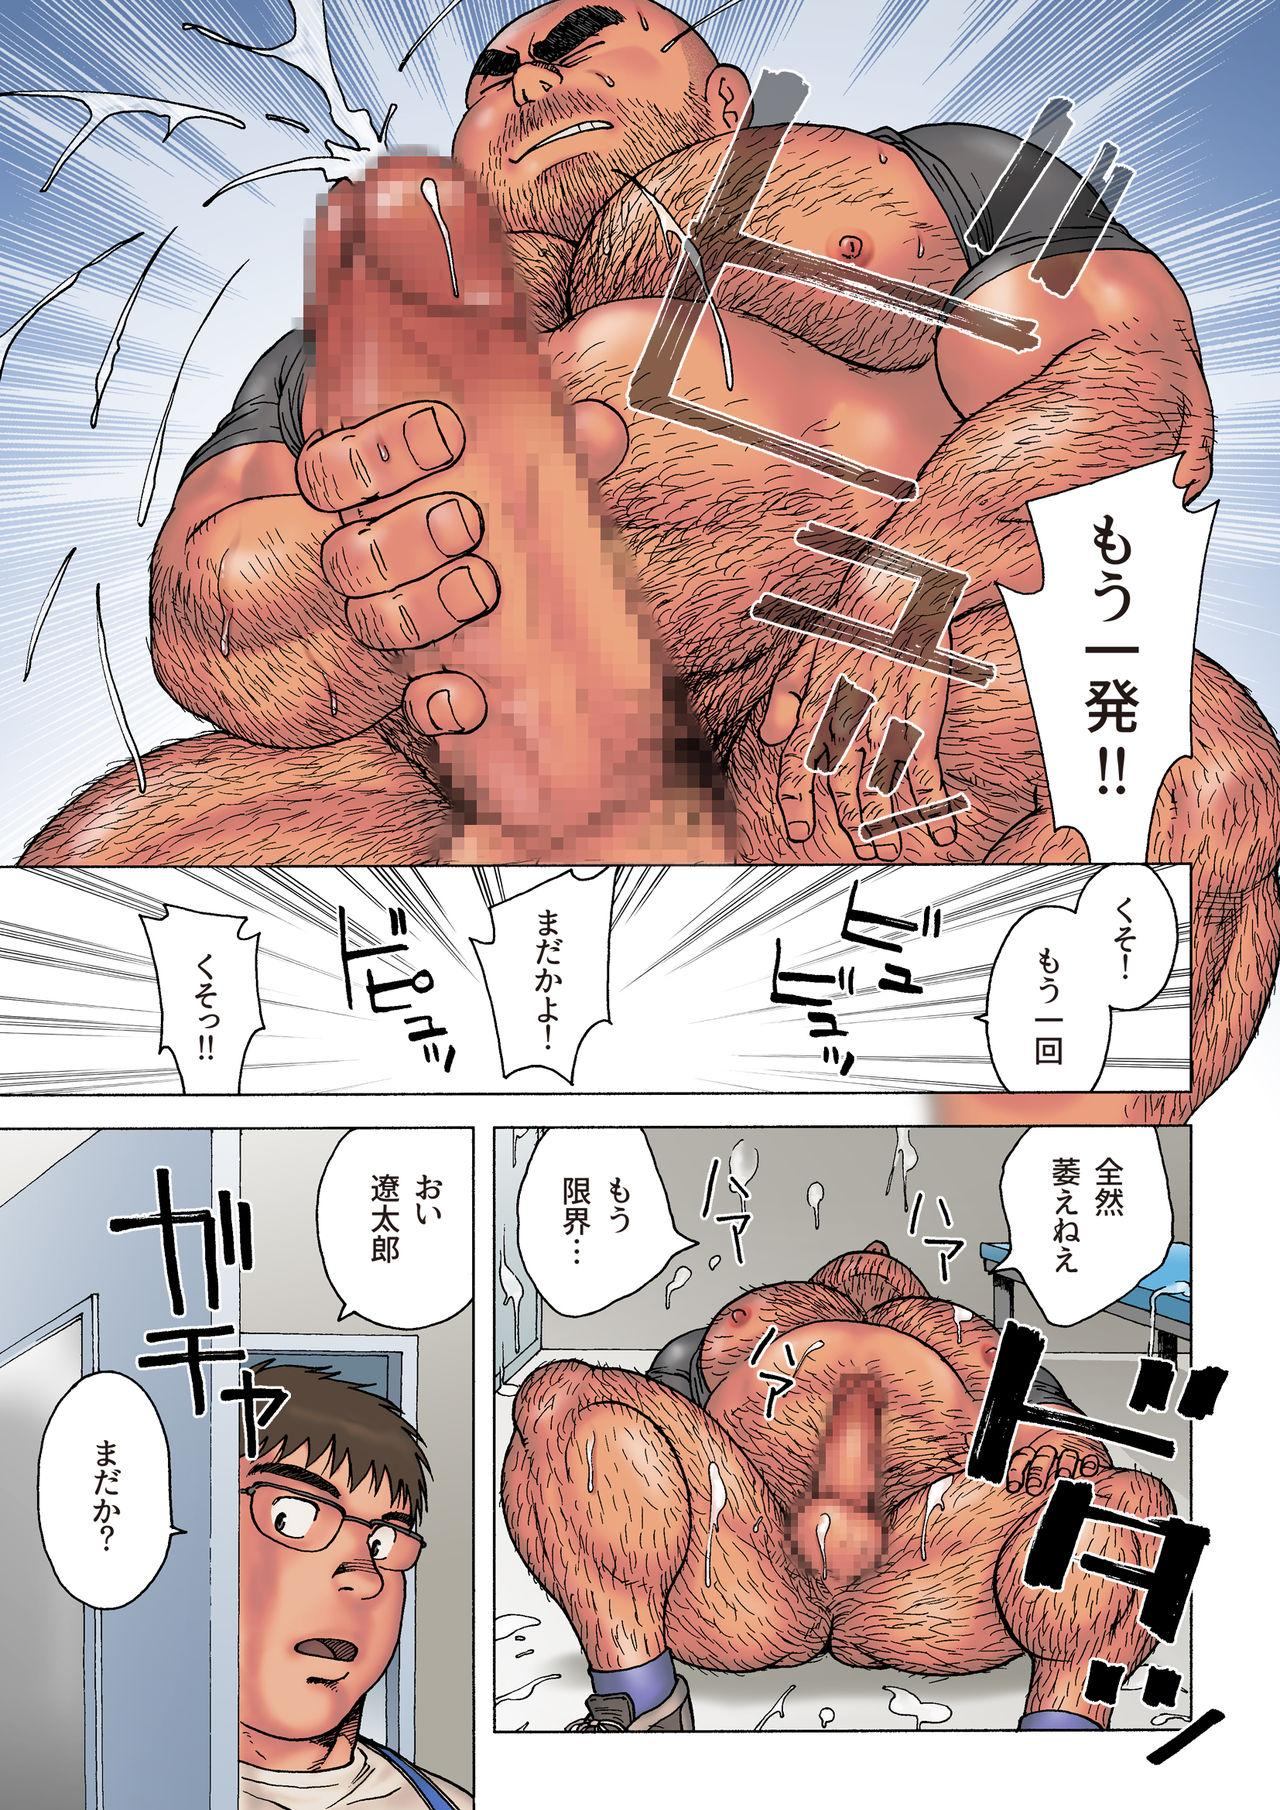 Danshi Koukousei Weightlifter Shiai-chuu, Osae kirenai Wakai Takeri 30